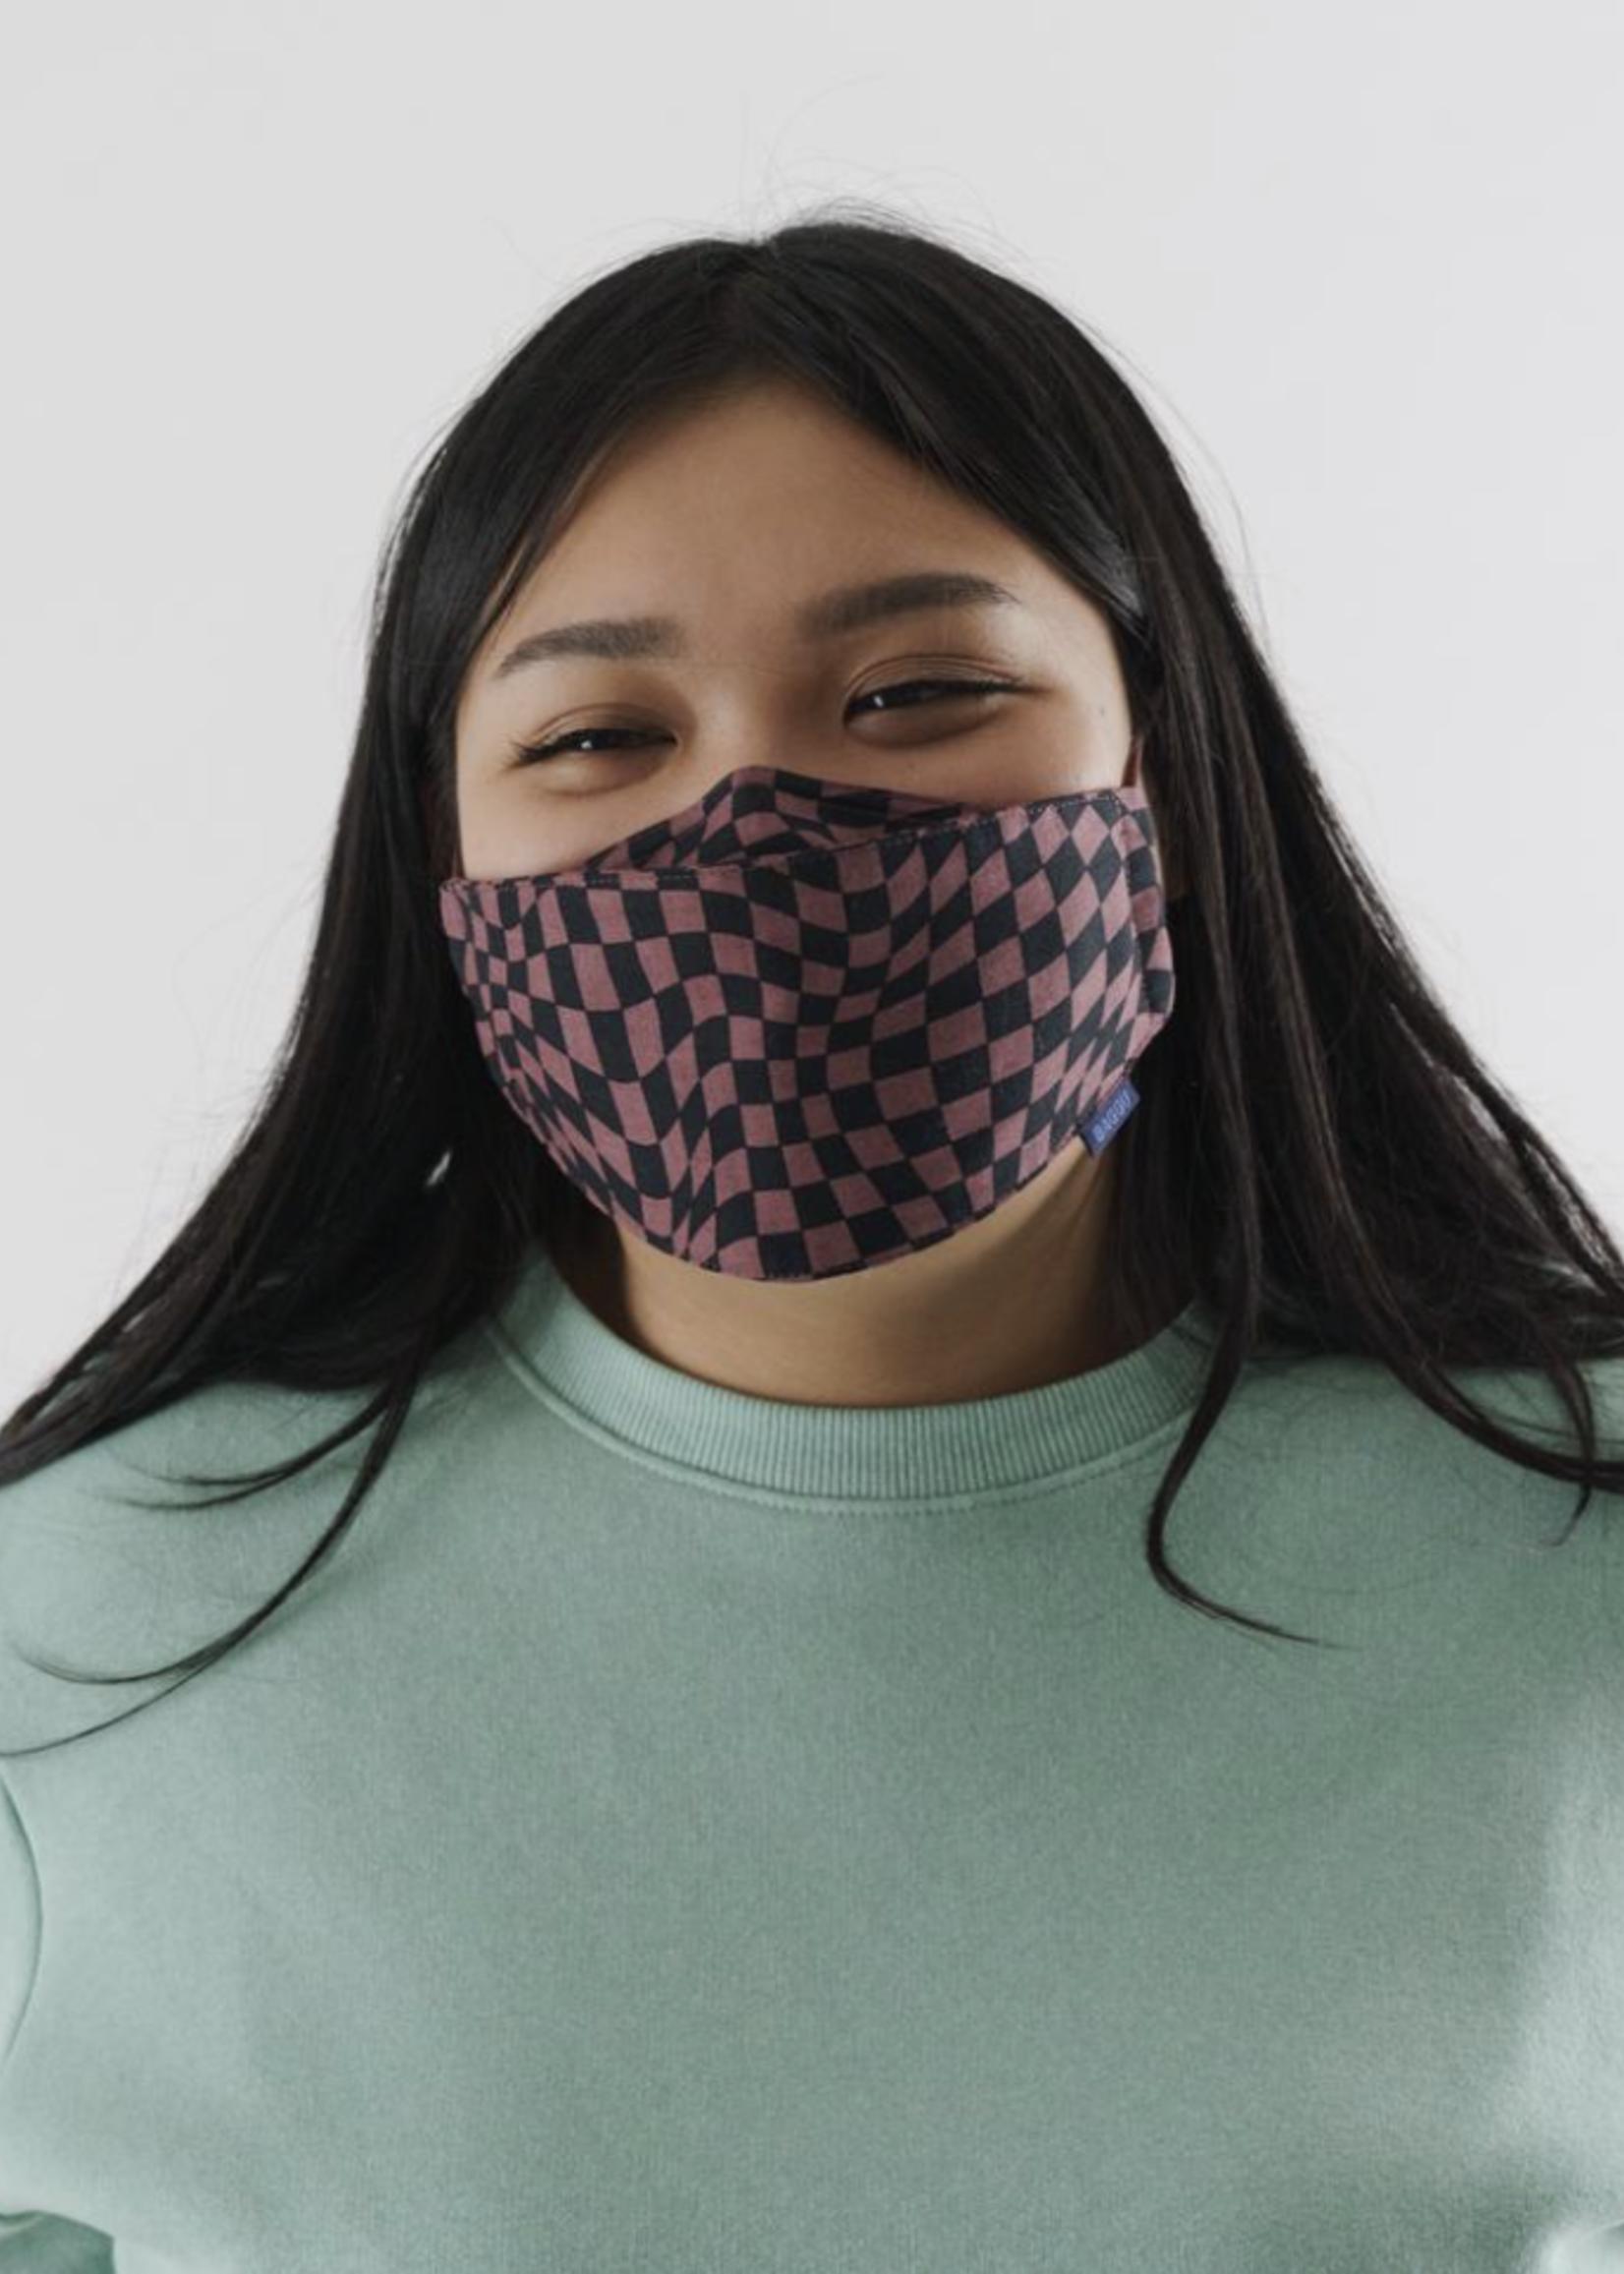 Baggu Trippy Checkers Cotton Face Masks by Baggu